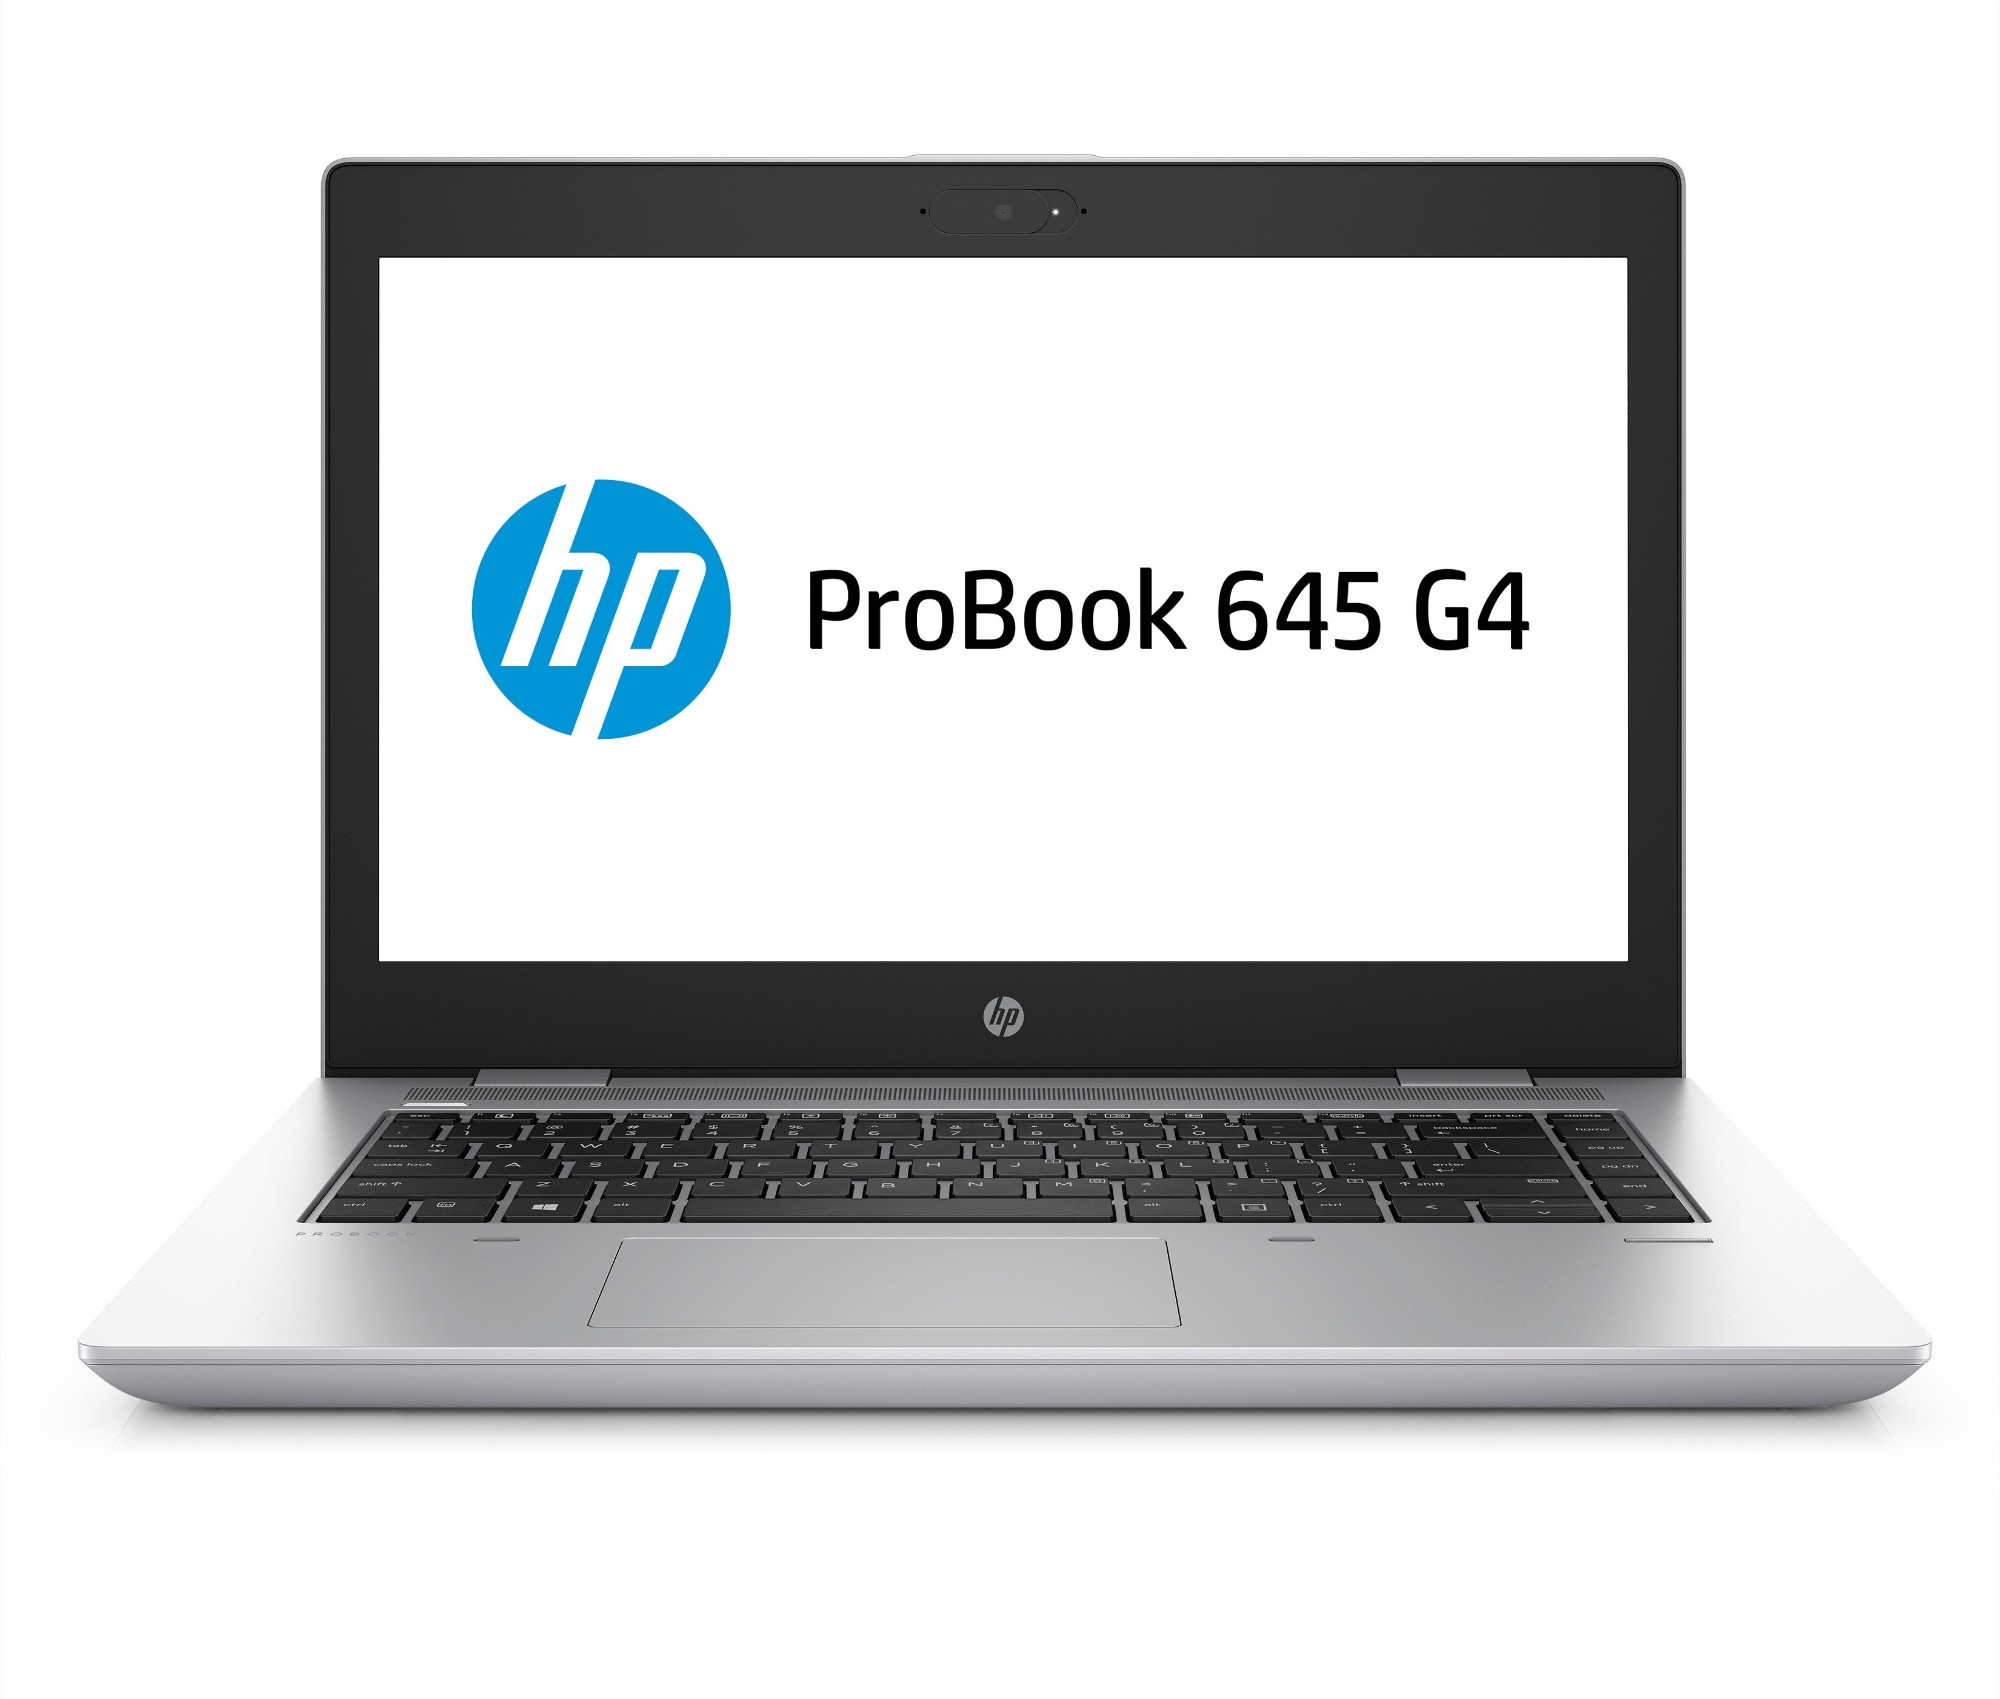 "HP ProBook 645 G4 Silver Notebook 35.6 cm (14"") 1920 x 1080 pixels AMD Ryzen 5 2500U 4 GB DDR4-SDRAM 128 GB SSD"